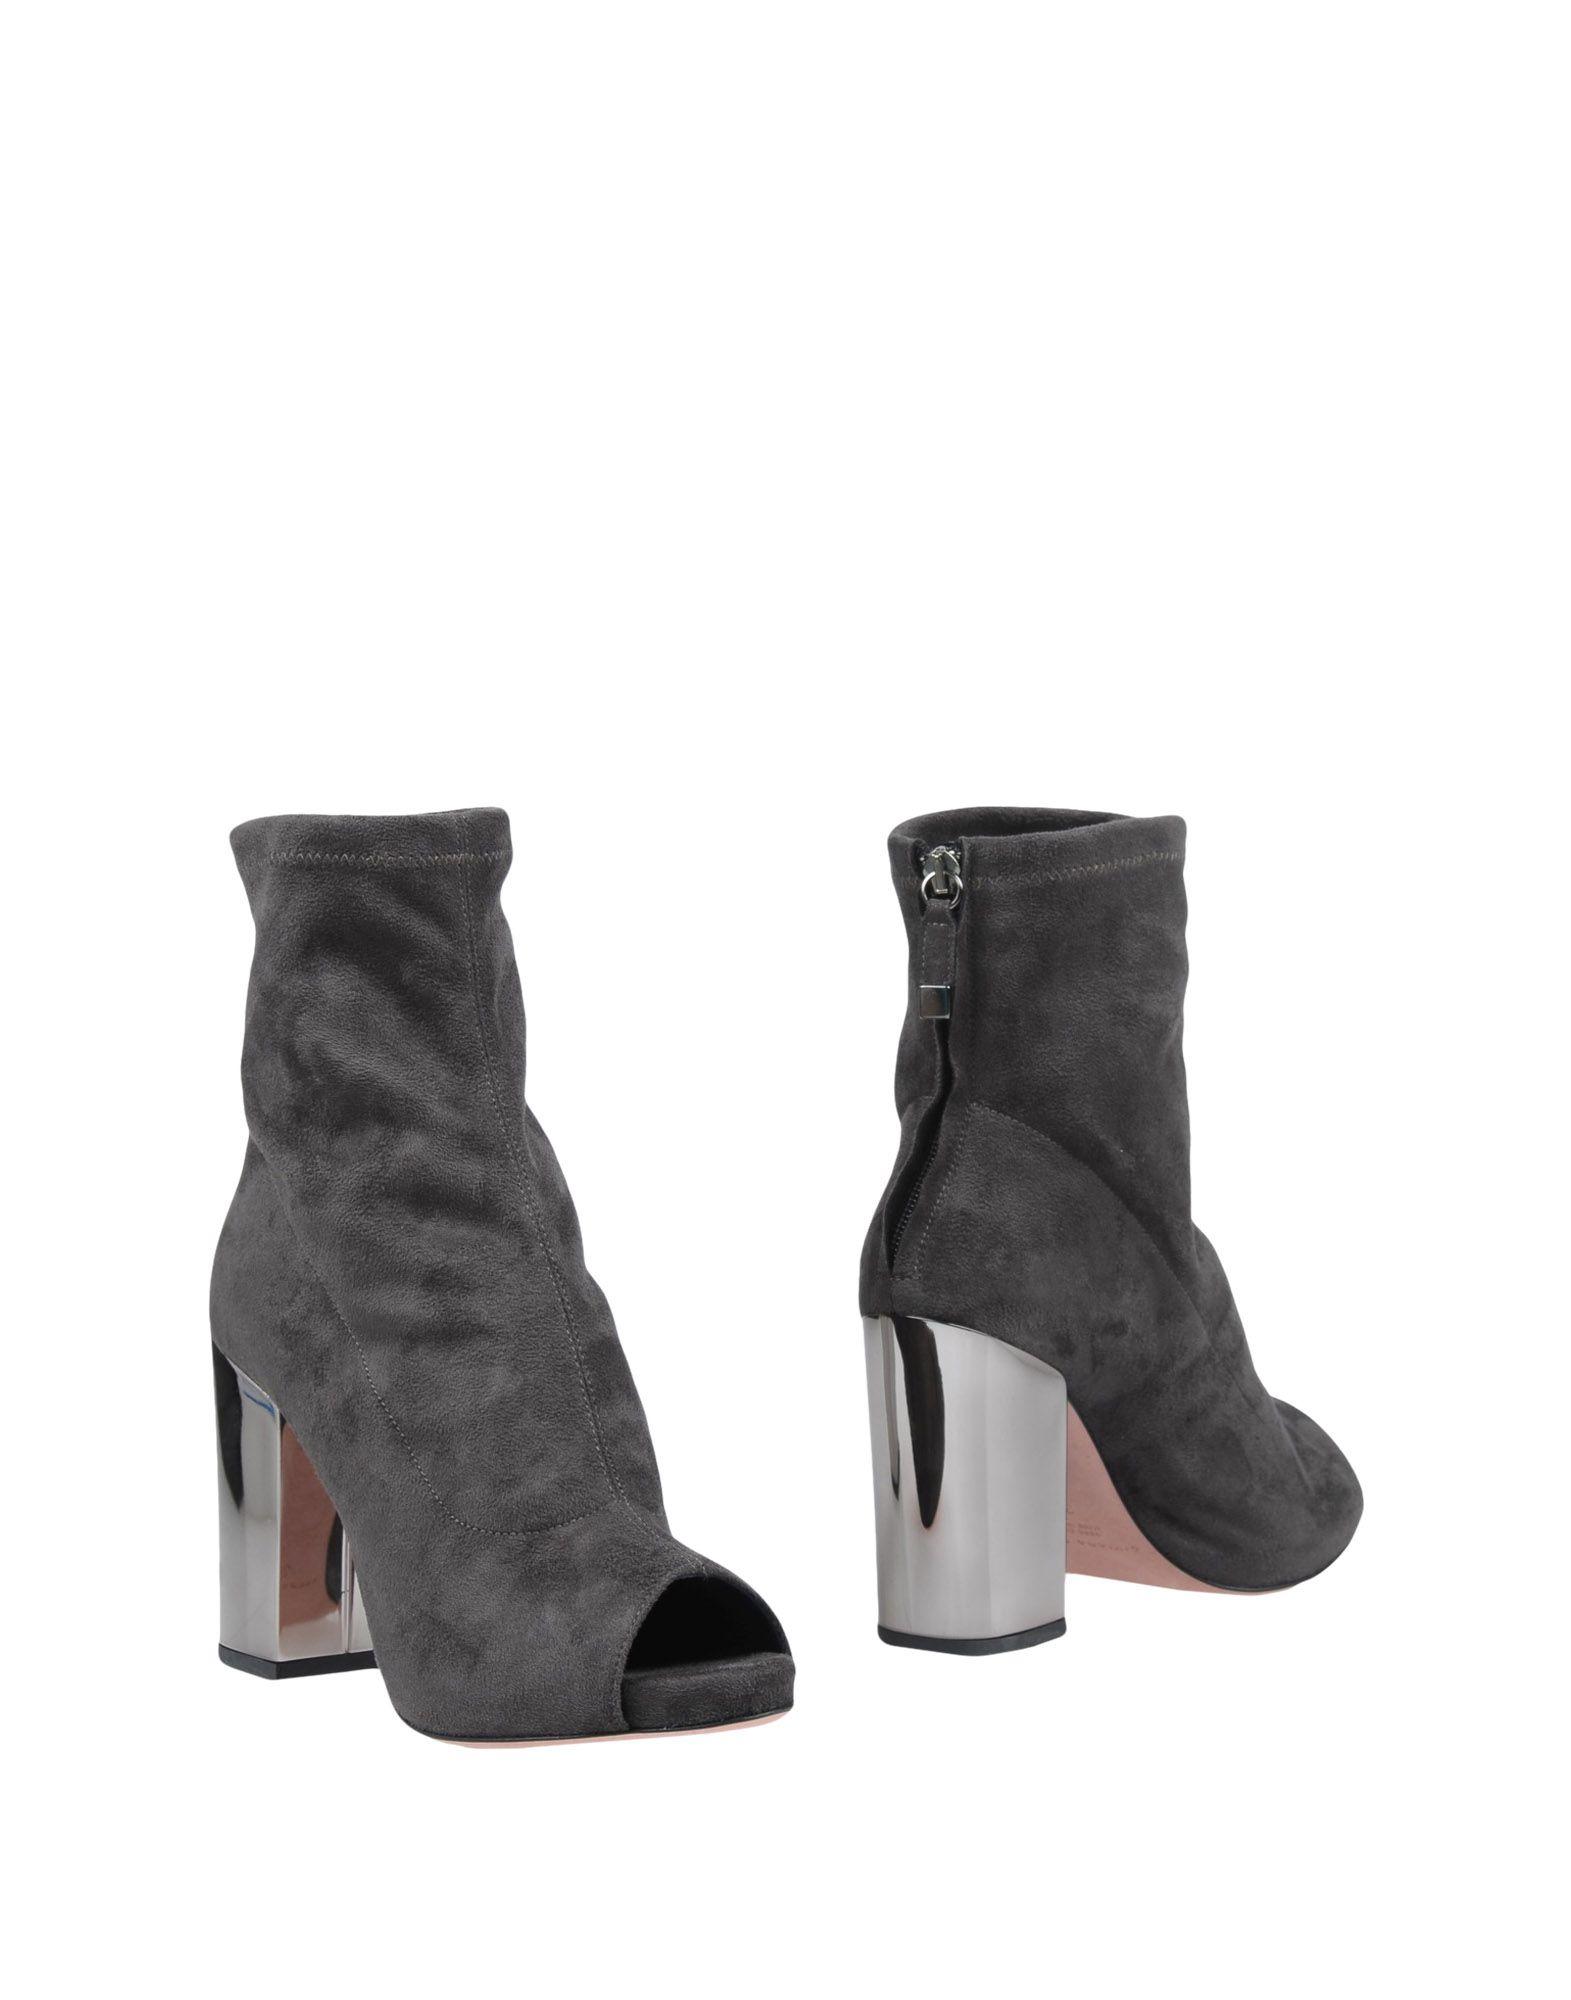 Rabatt Schuhe Stiefelette Liviana Conti Stiefelette Schuhe Damen  11422183FB aa82ce